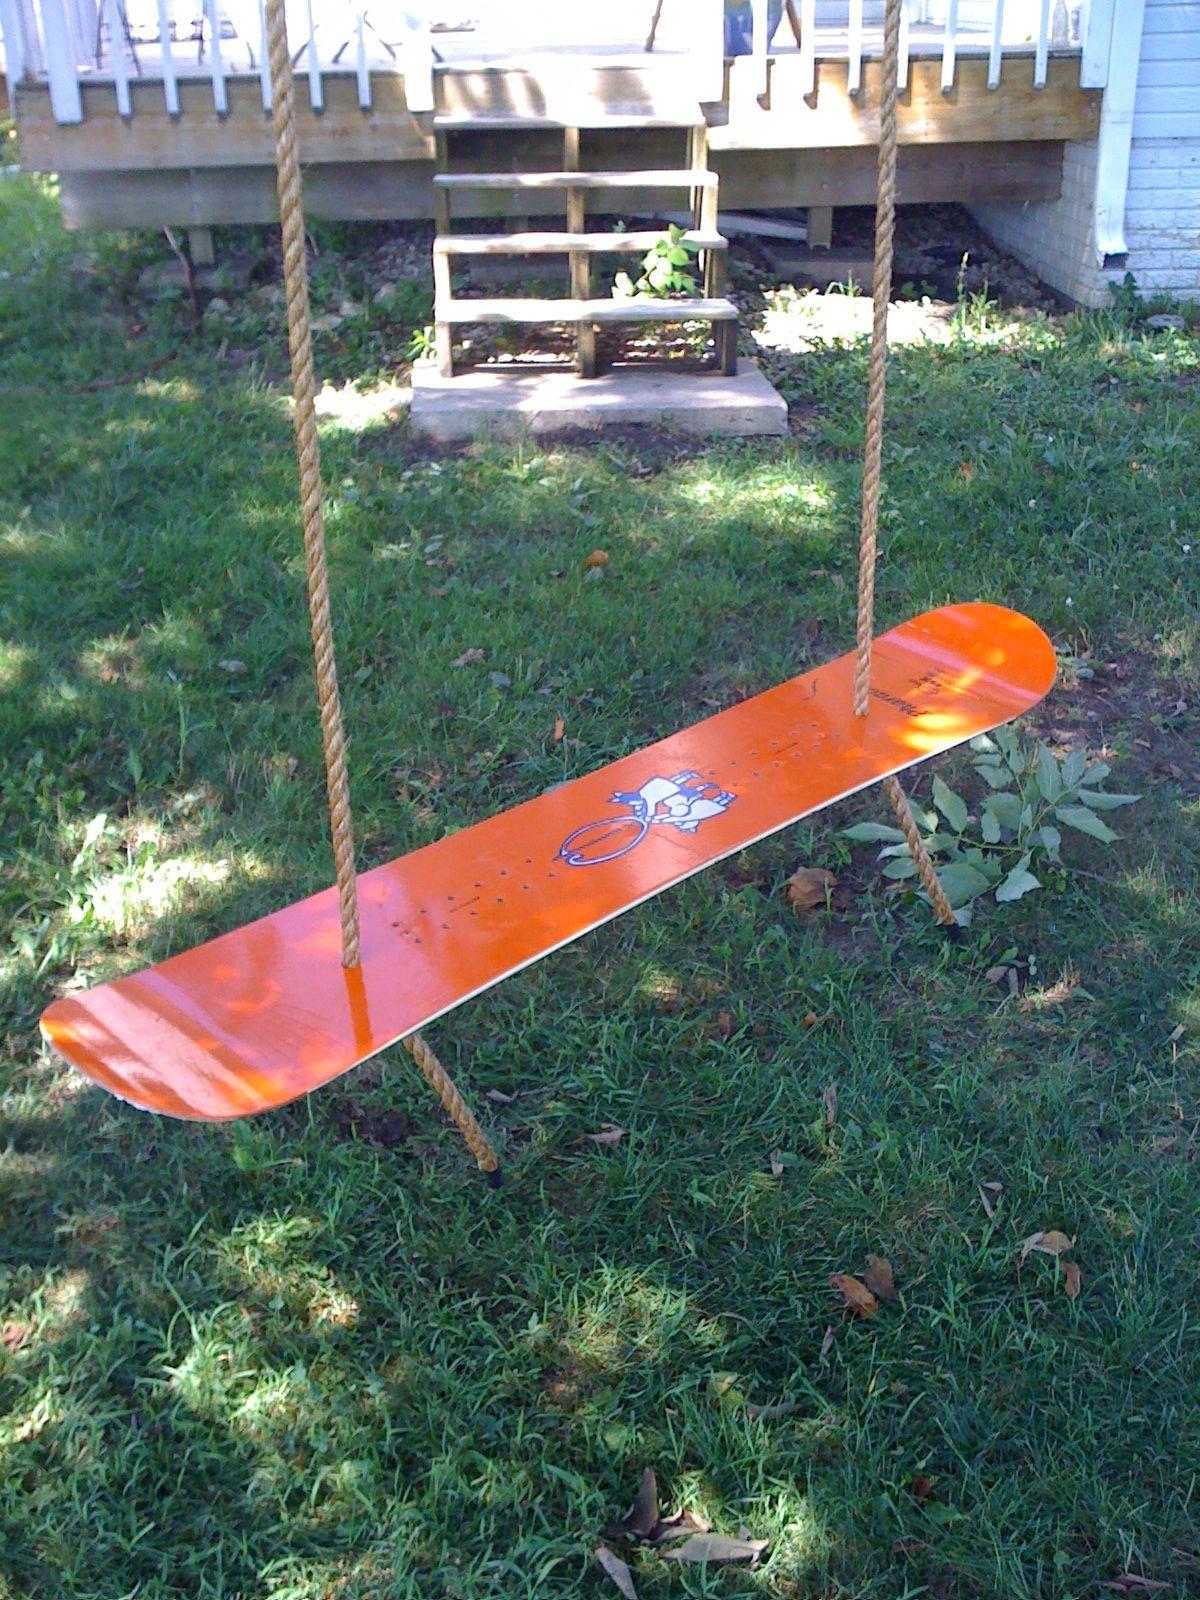 pepperharrow farm repurposing an old snowboard farm ideas